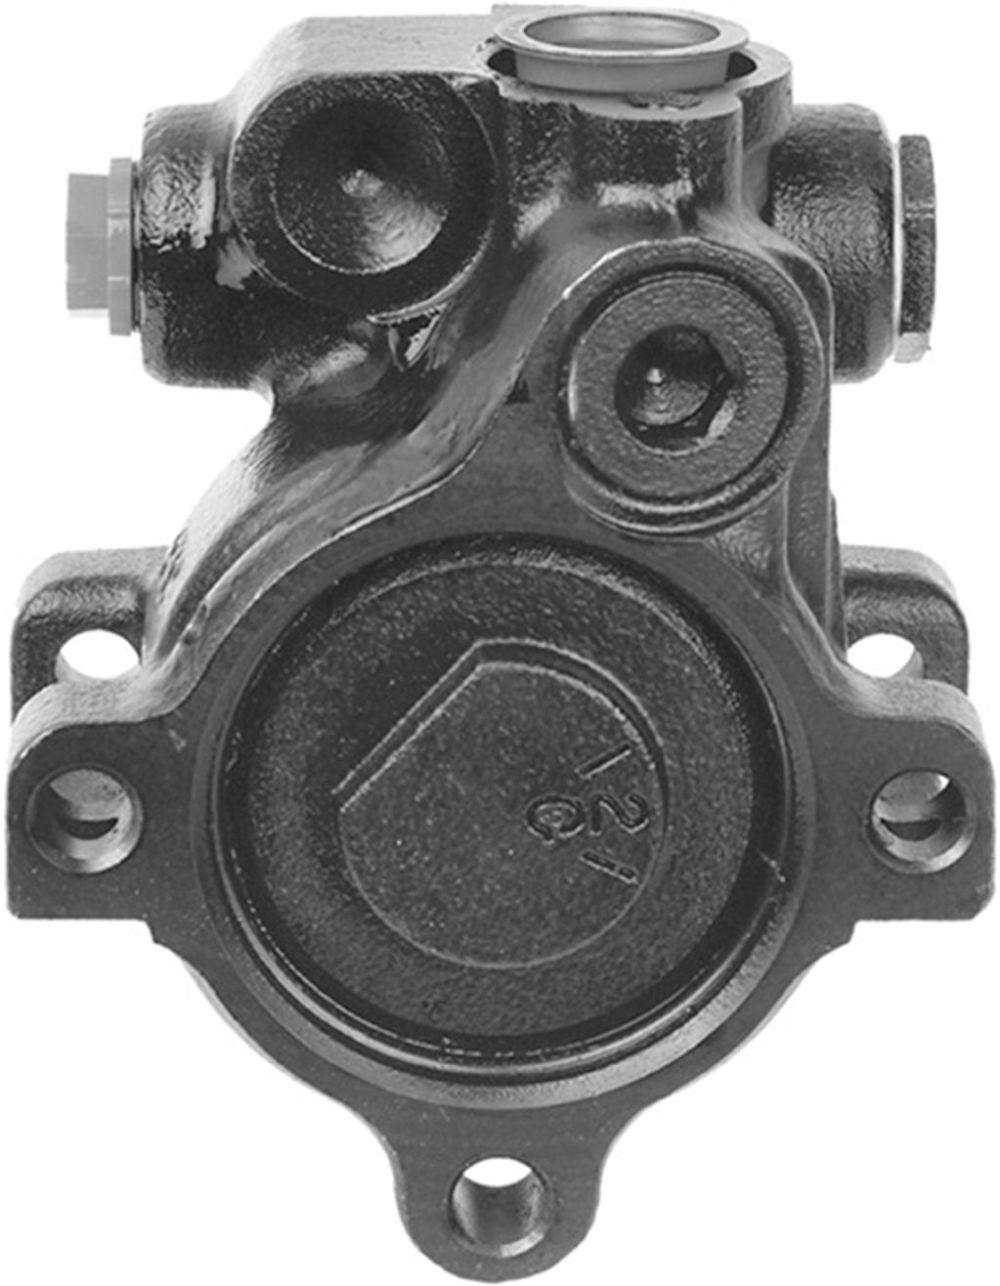 medium resolution of 2006 mercury montego power steering pump a1 20 323